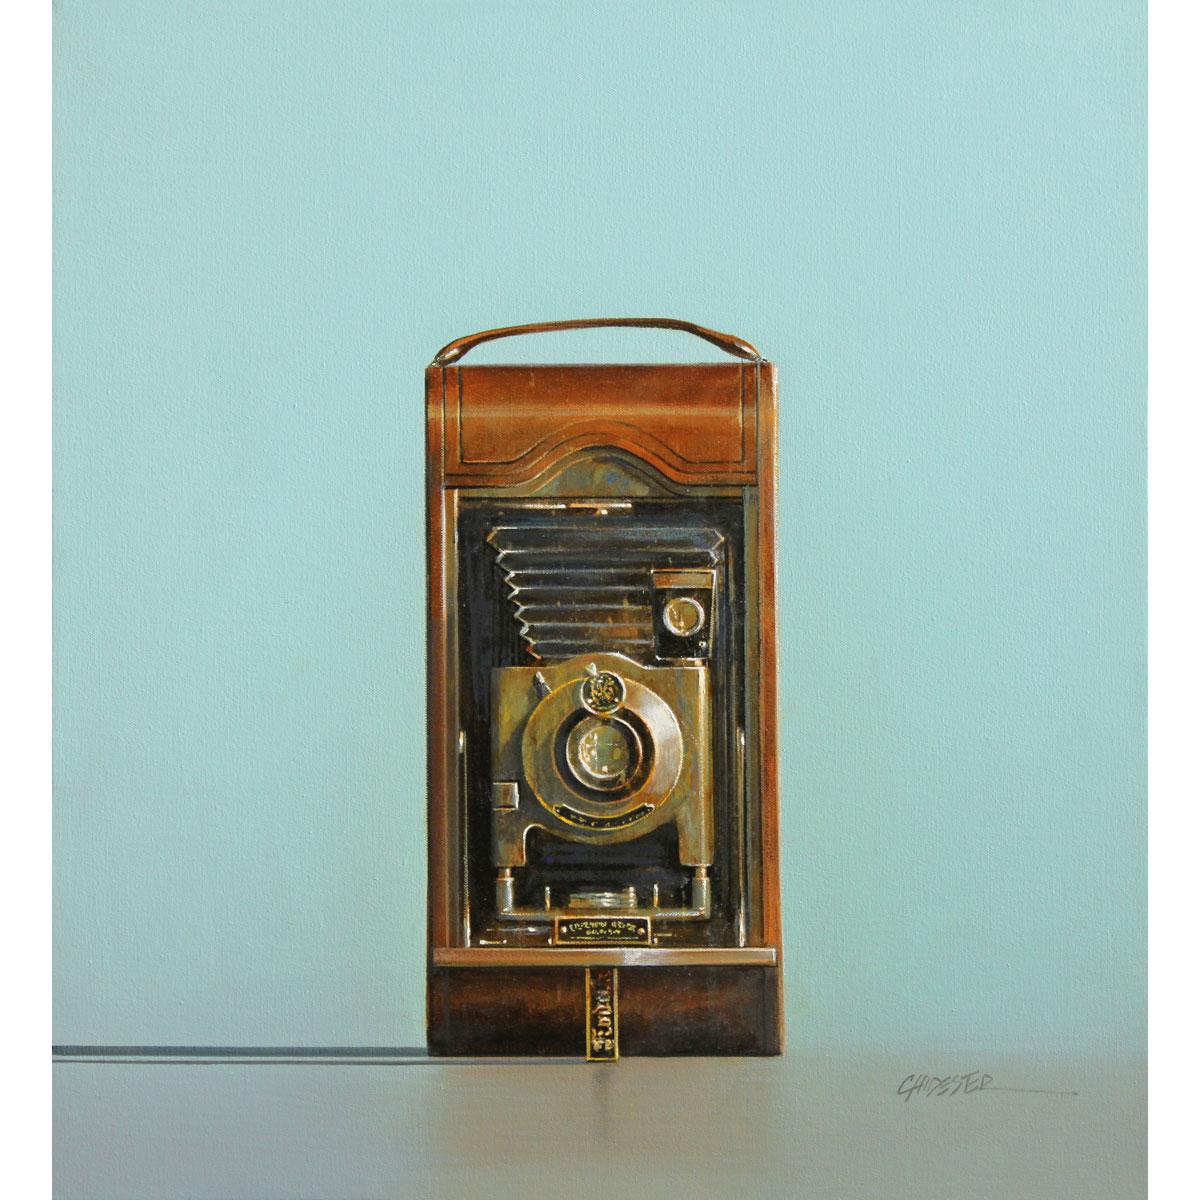 No. 3A Kodak by Wendy Chidester